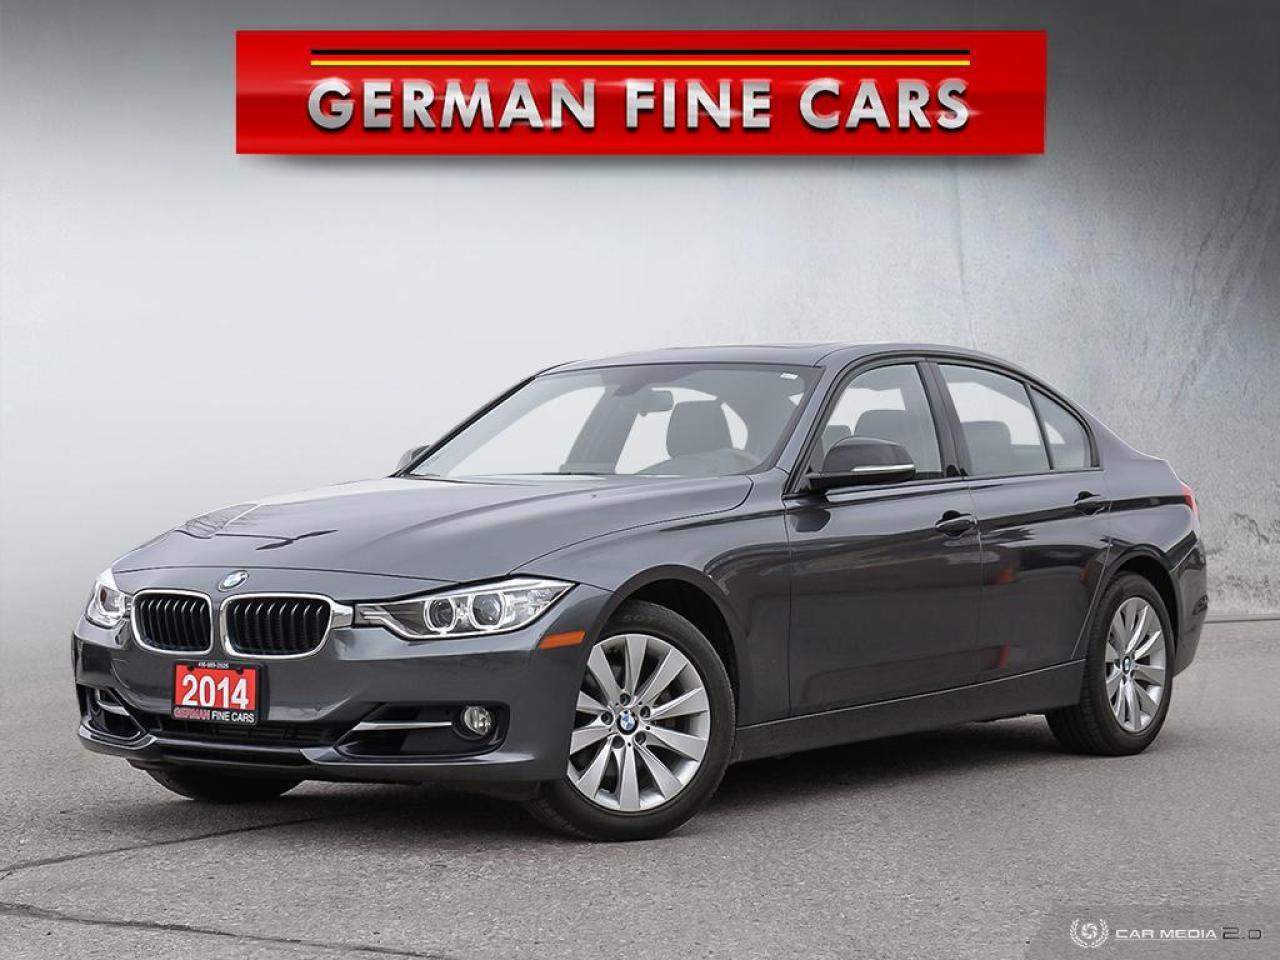 2014 BMW 3 Series 328i xDrive SPORT*NAVIGATION, BACK UP CAMERA, AWD*